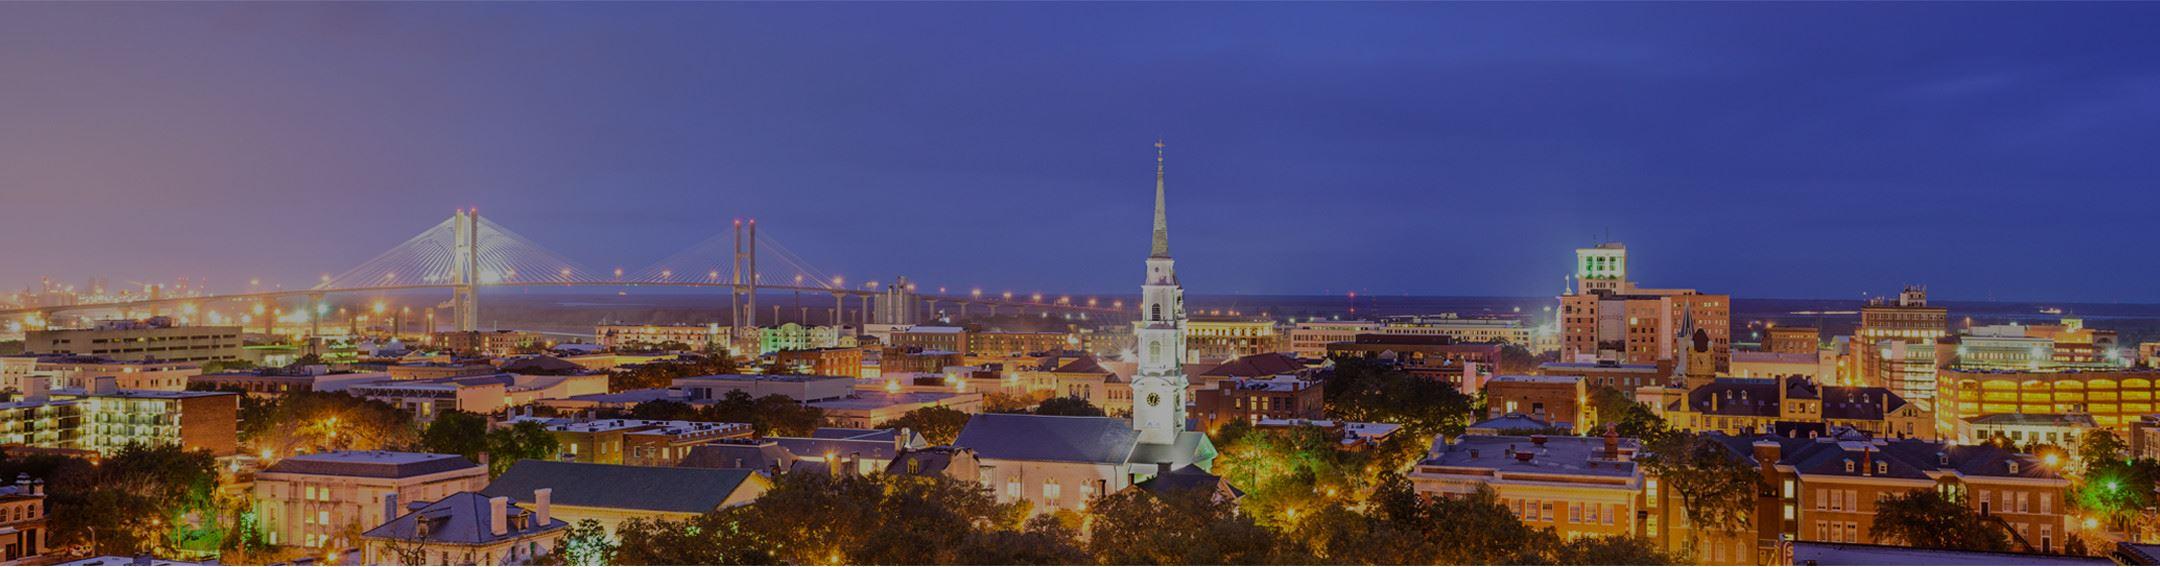 Savannah ga official website nvjuhfo Images